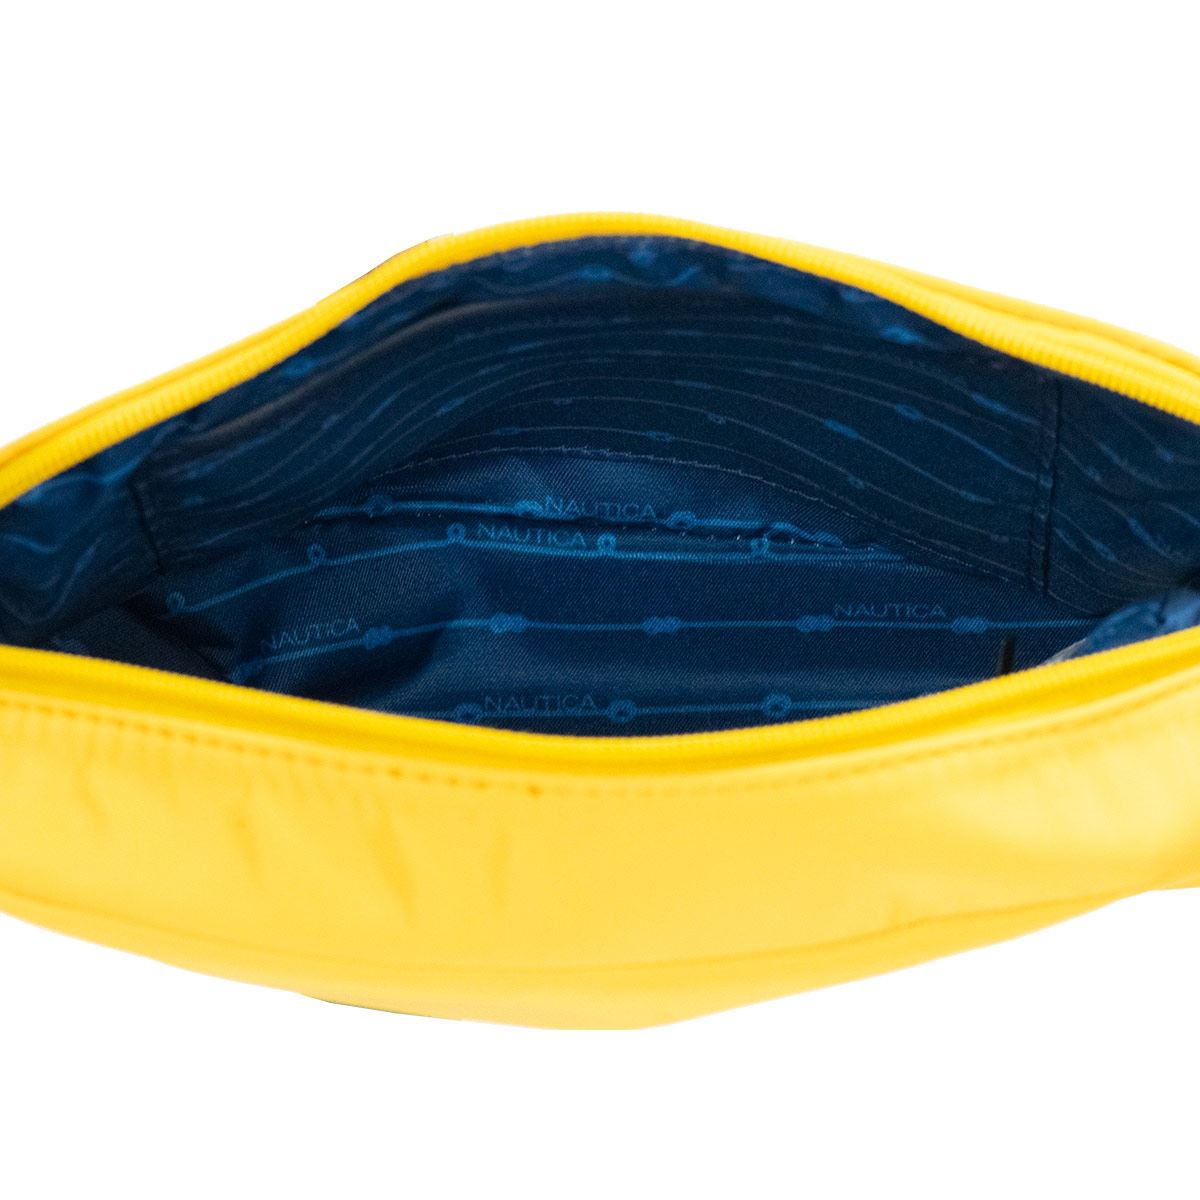 Bolso Back Pack Nautica Amarilla Modelo A01852